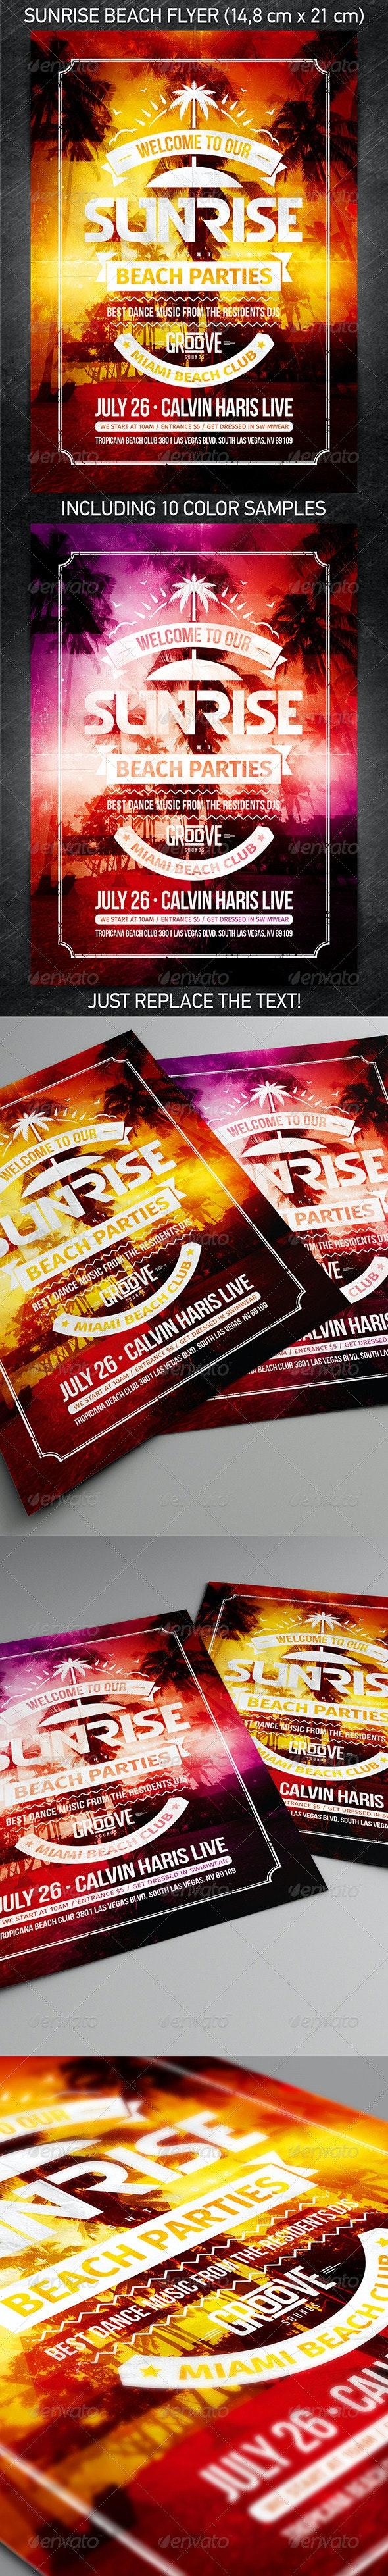 Sunrise Beach Party Flyer - Events Flyers